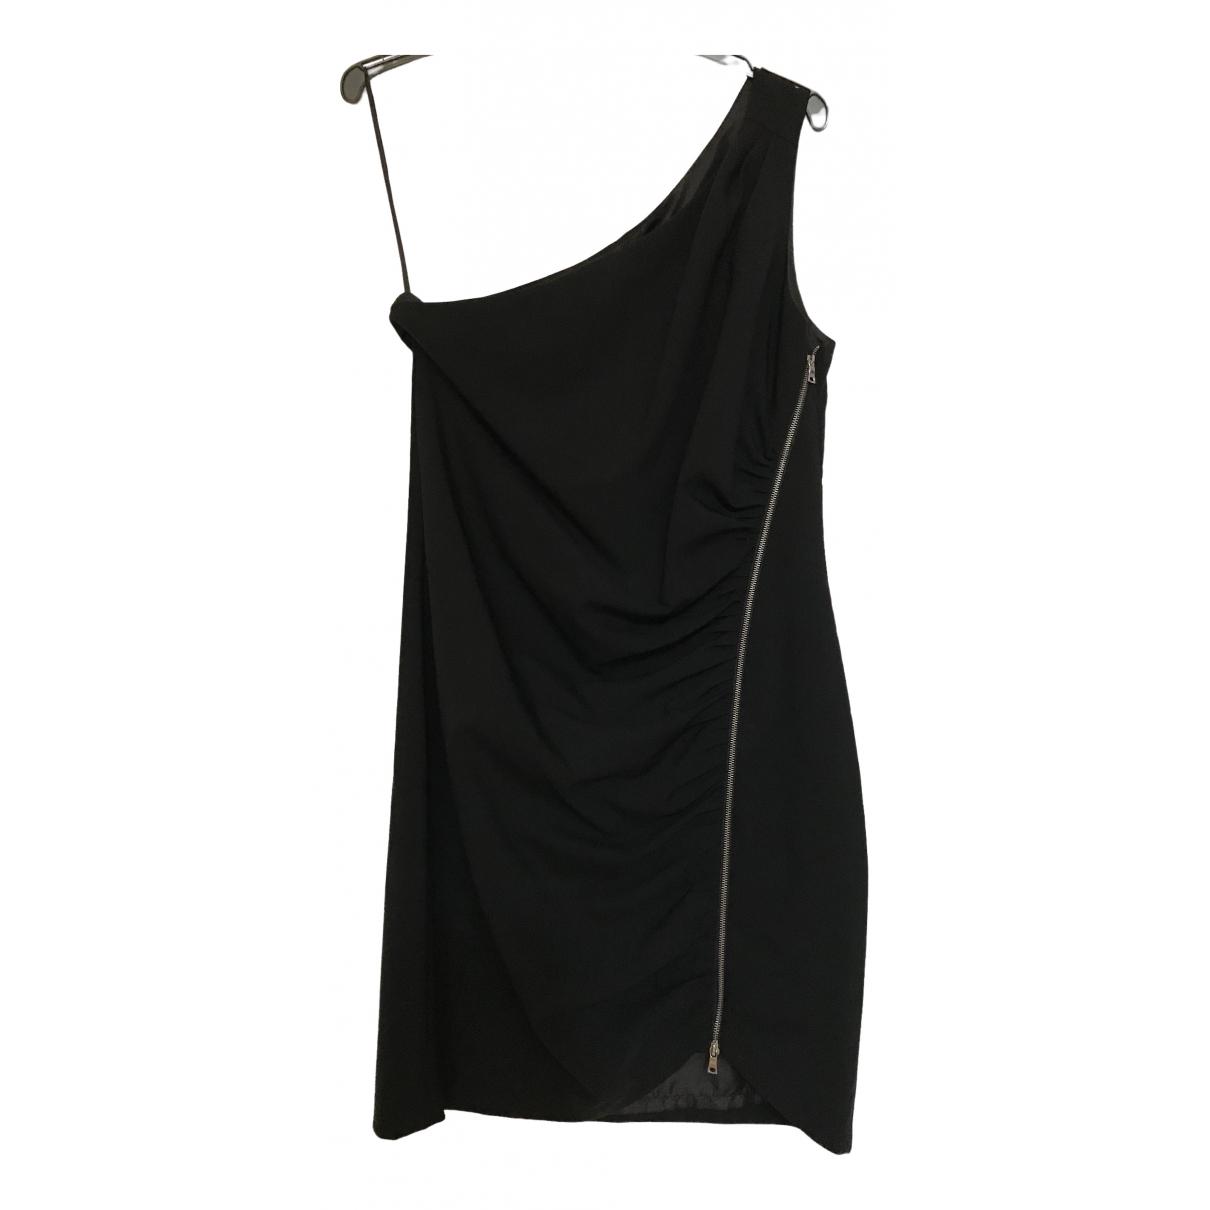 Cynthia Steffe \N Kleid in  Schwarz Wolle